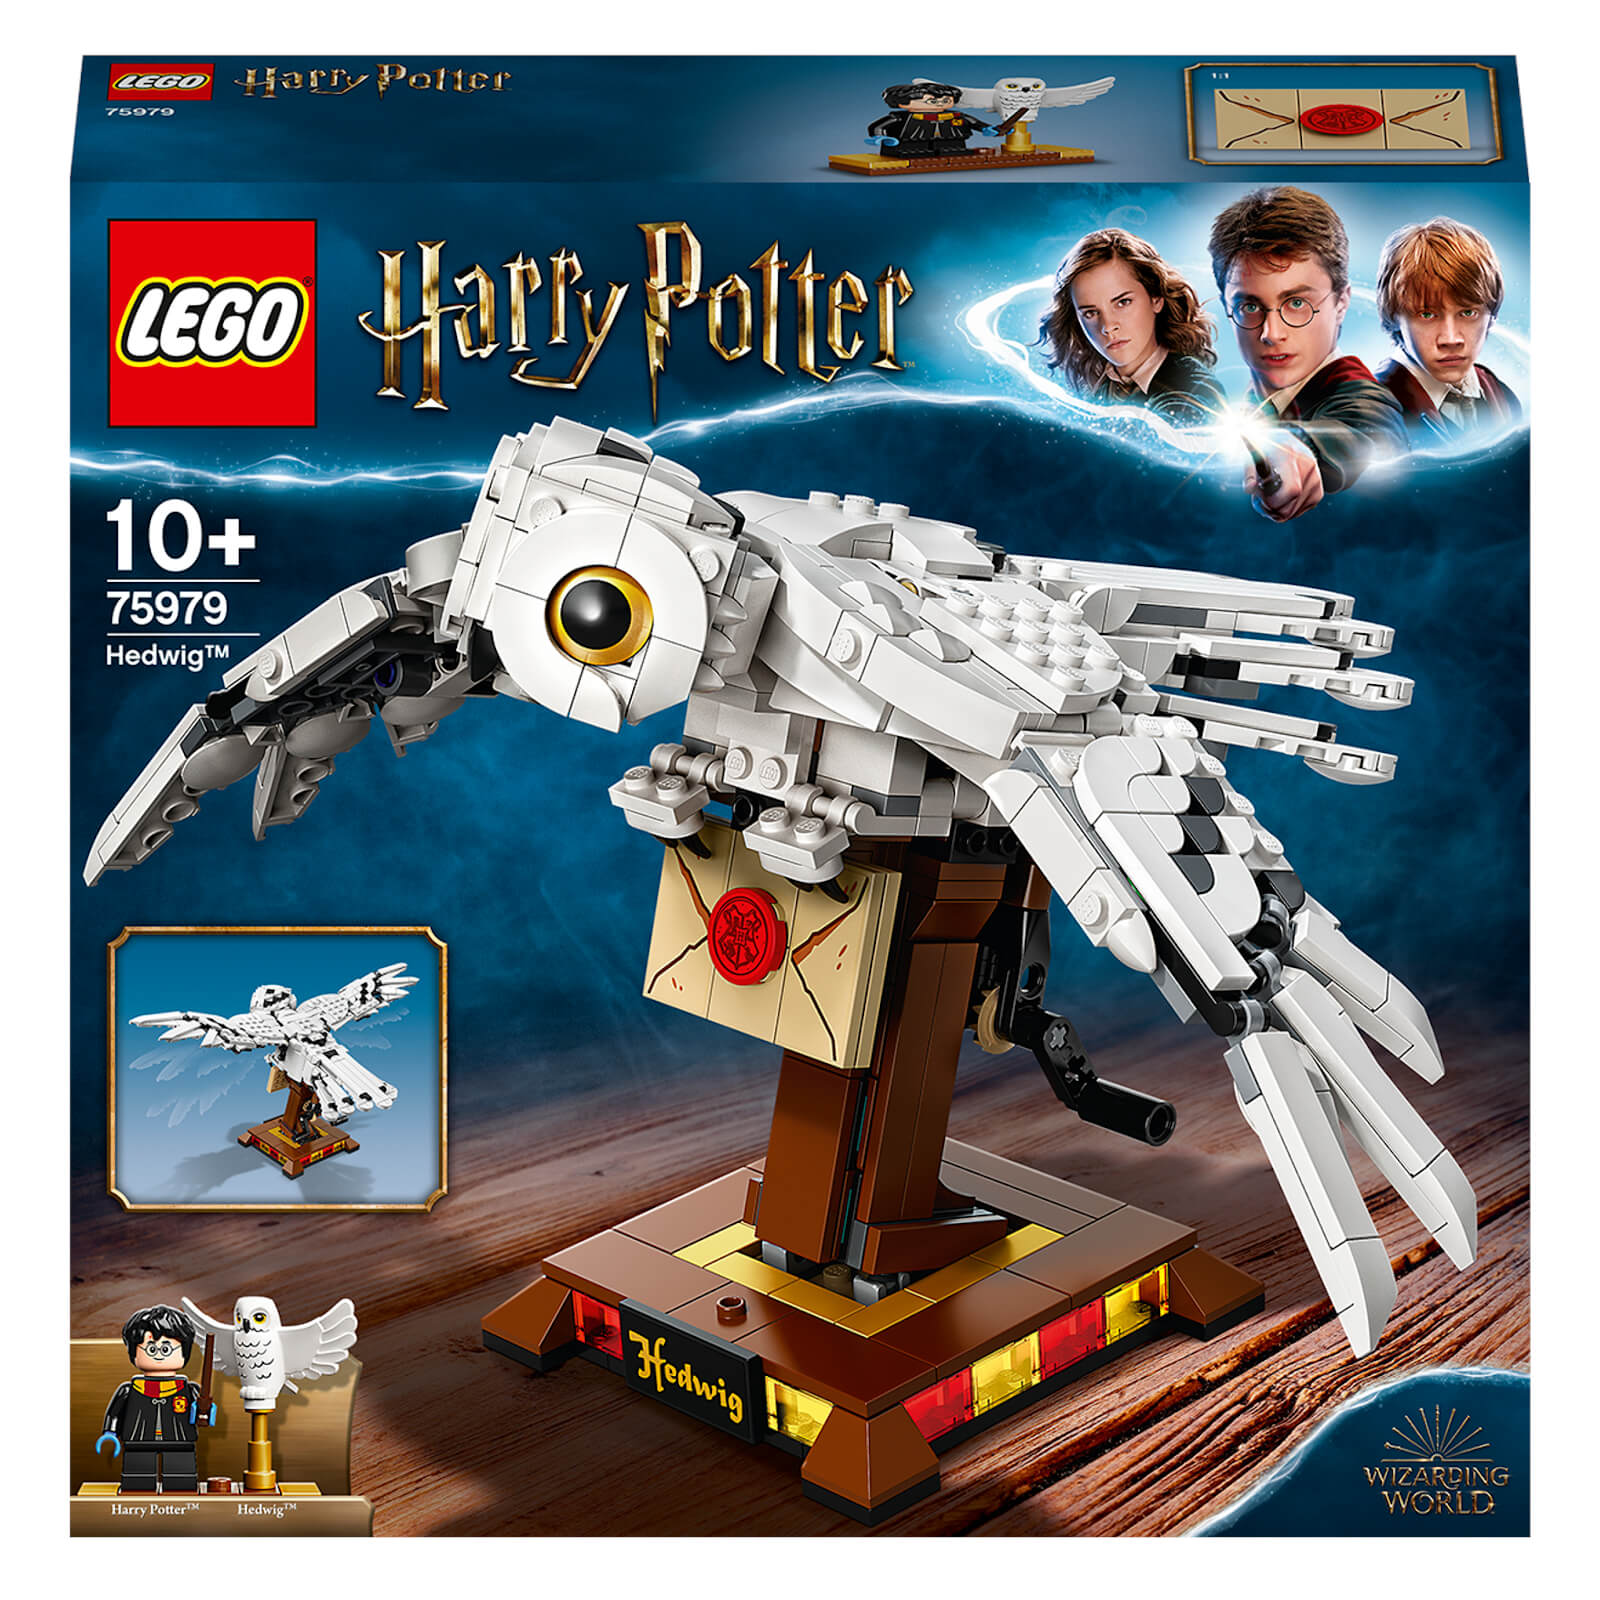 Image of LEGO Harry Potter - Hedwig